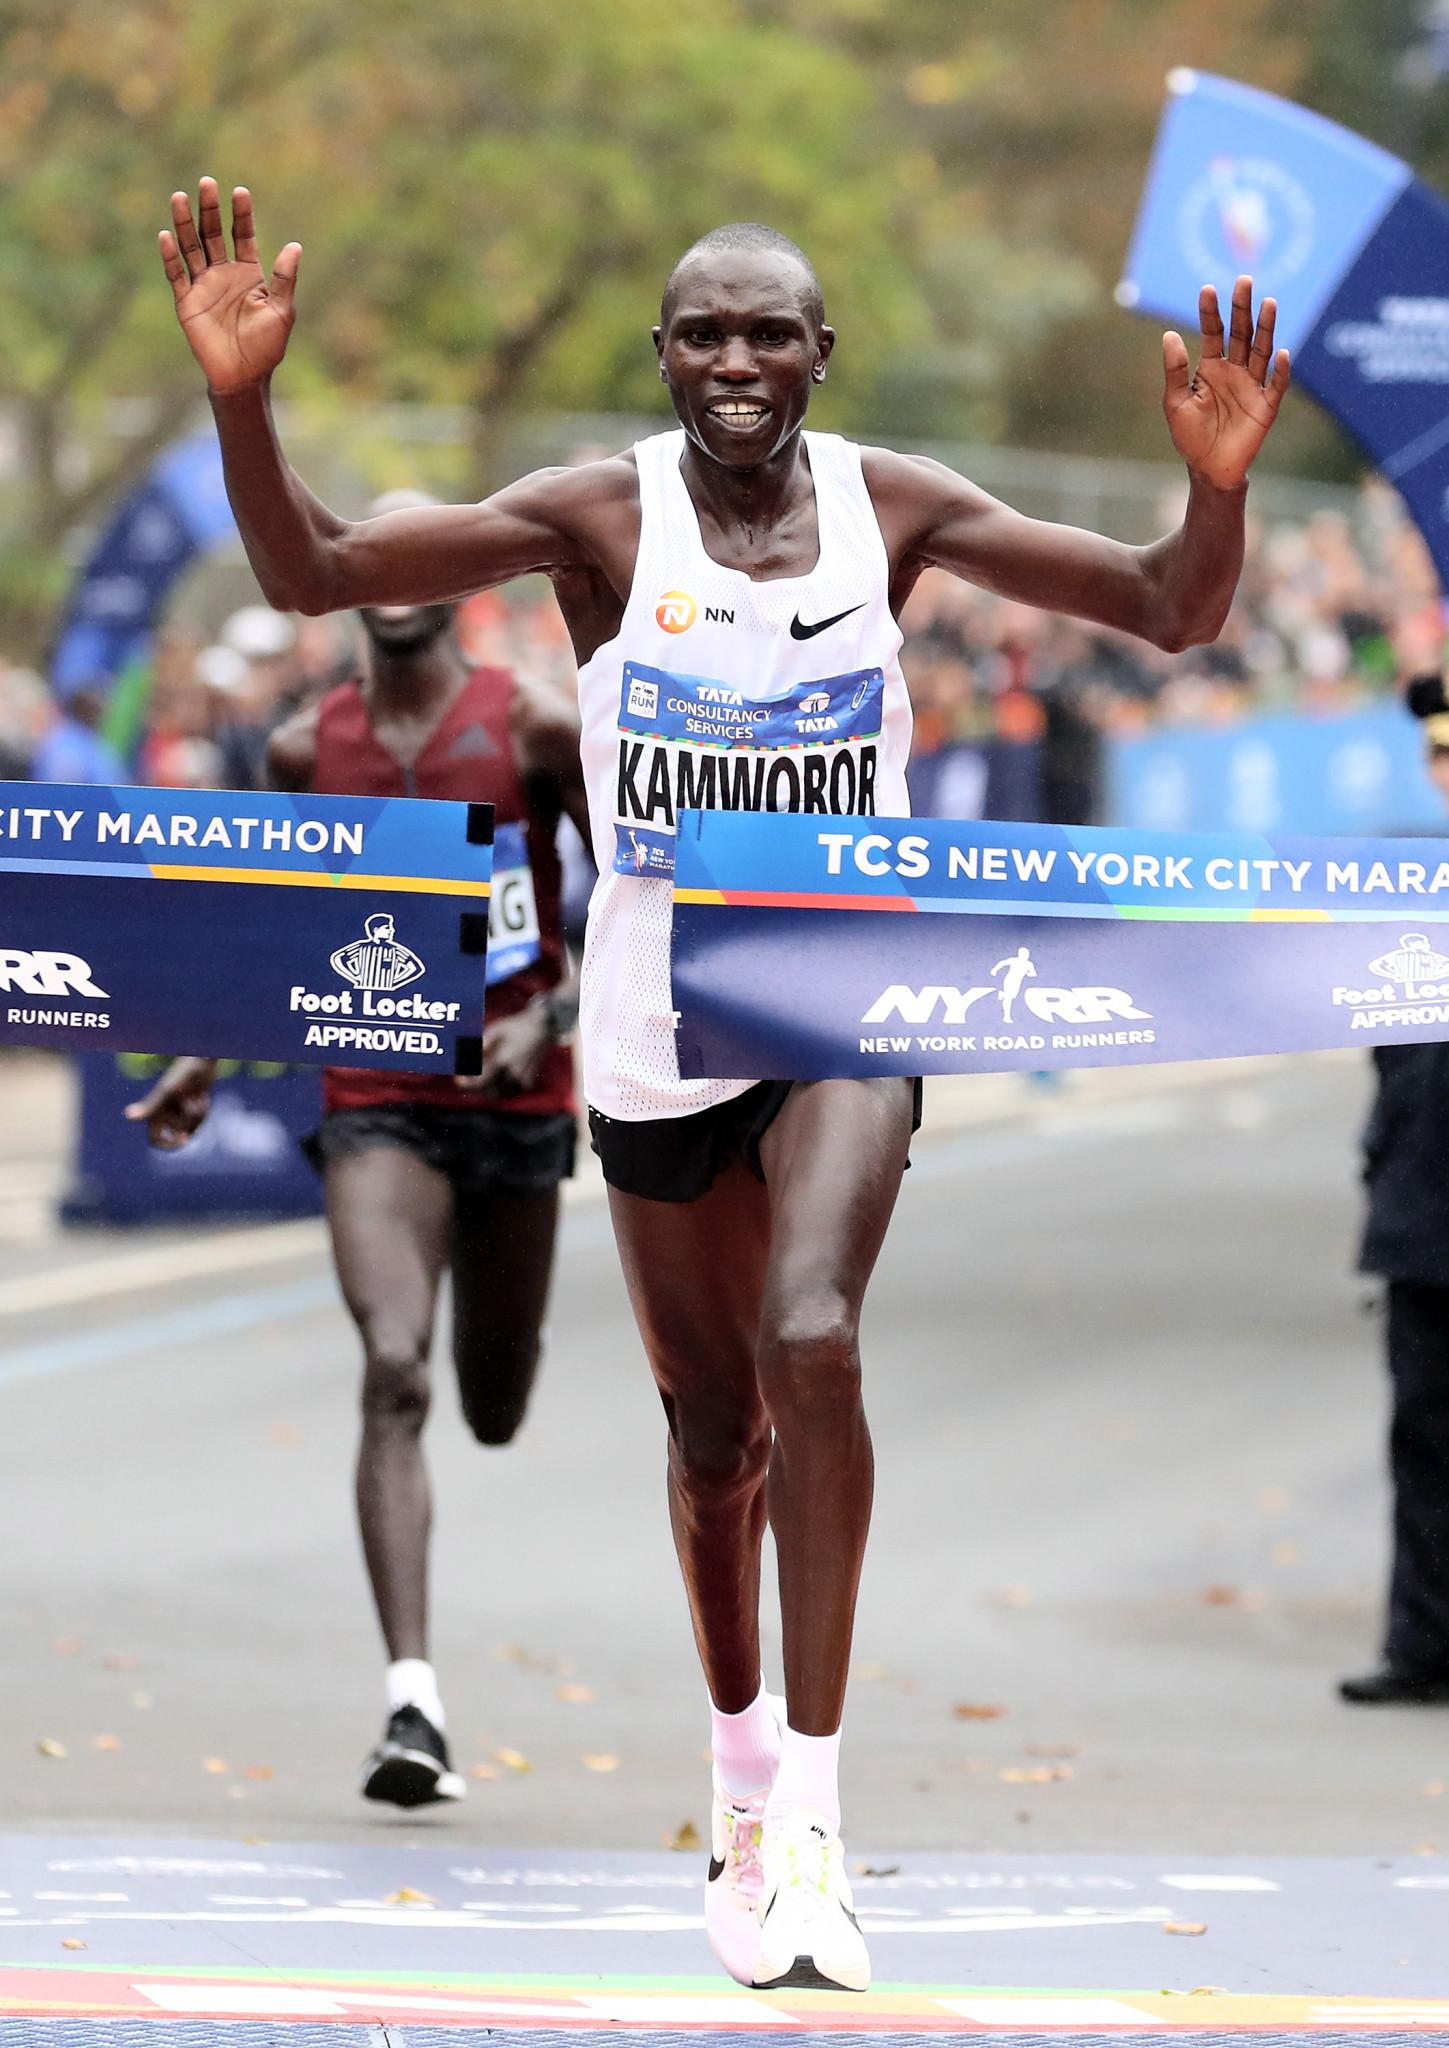 Kenyan Kamworor cruises to a maiden marathon victory in New York